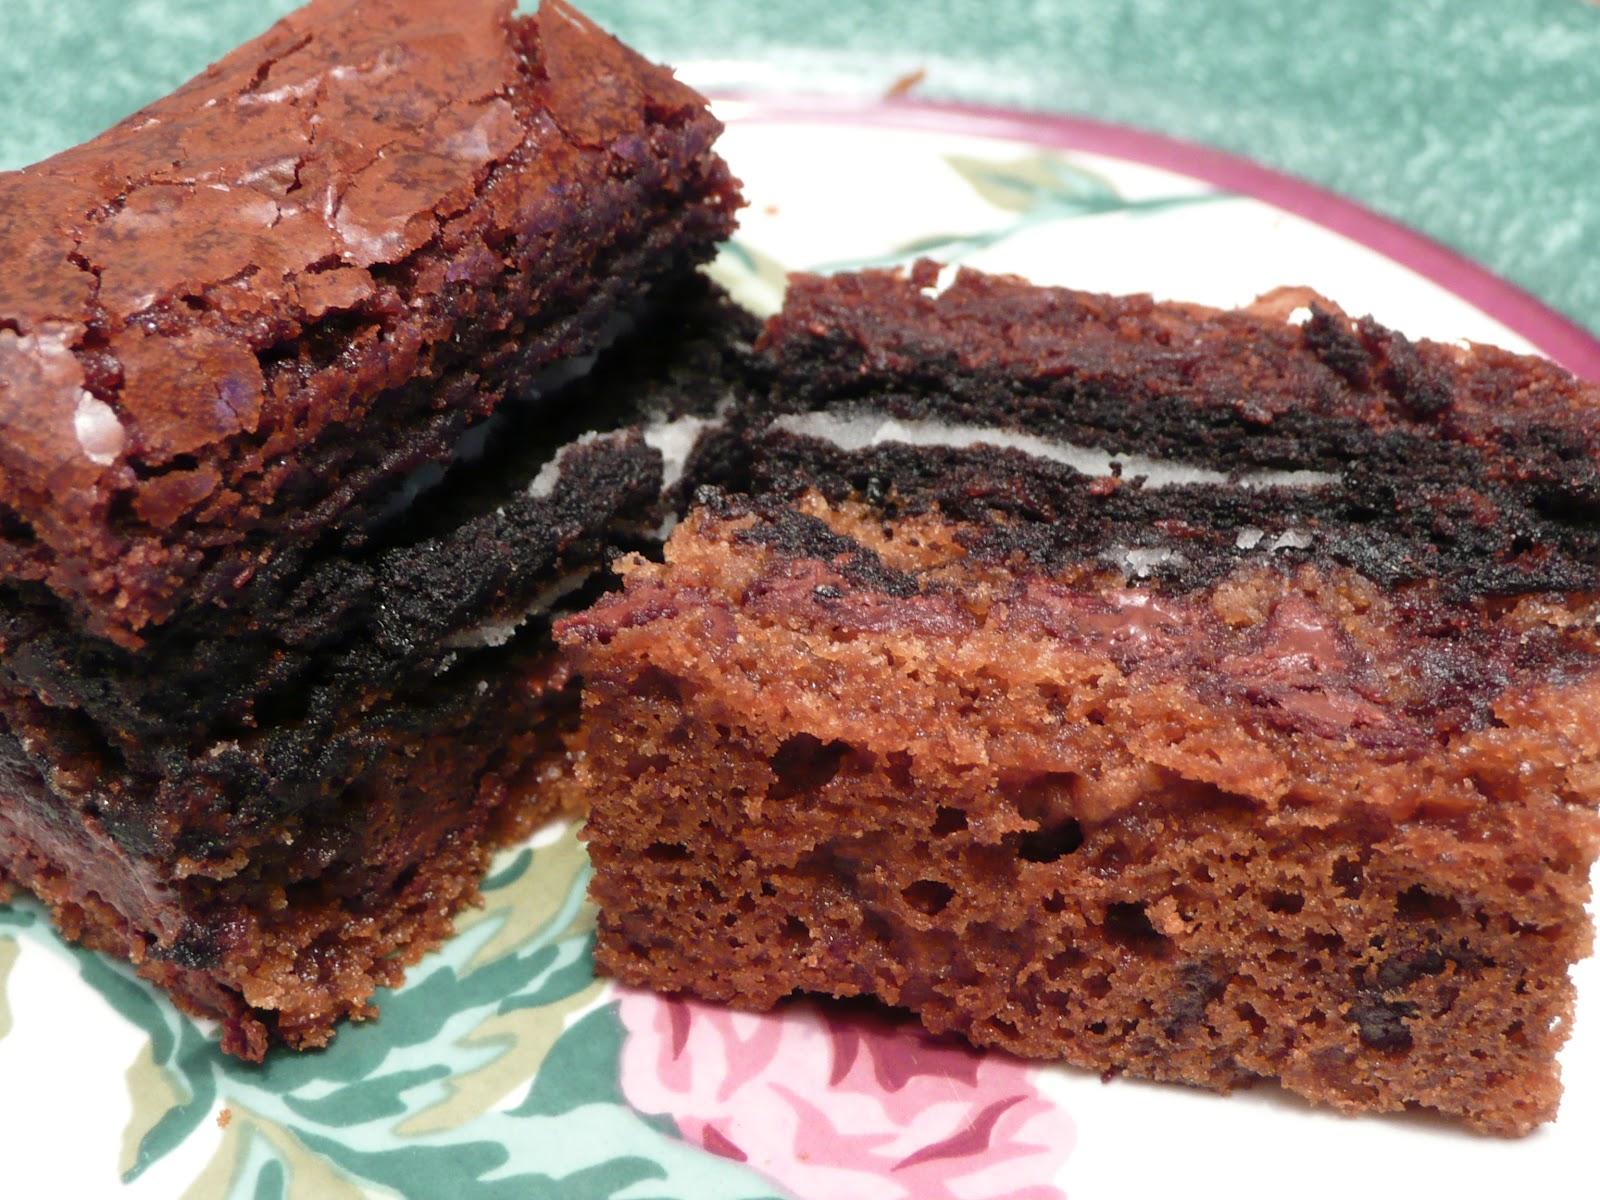 Legal Tines: Slutty Brownies